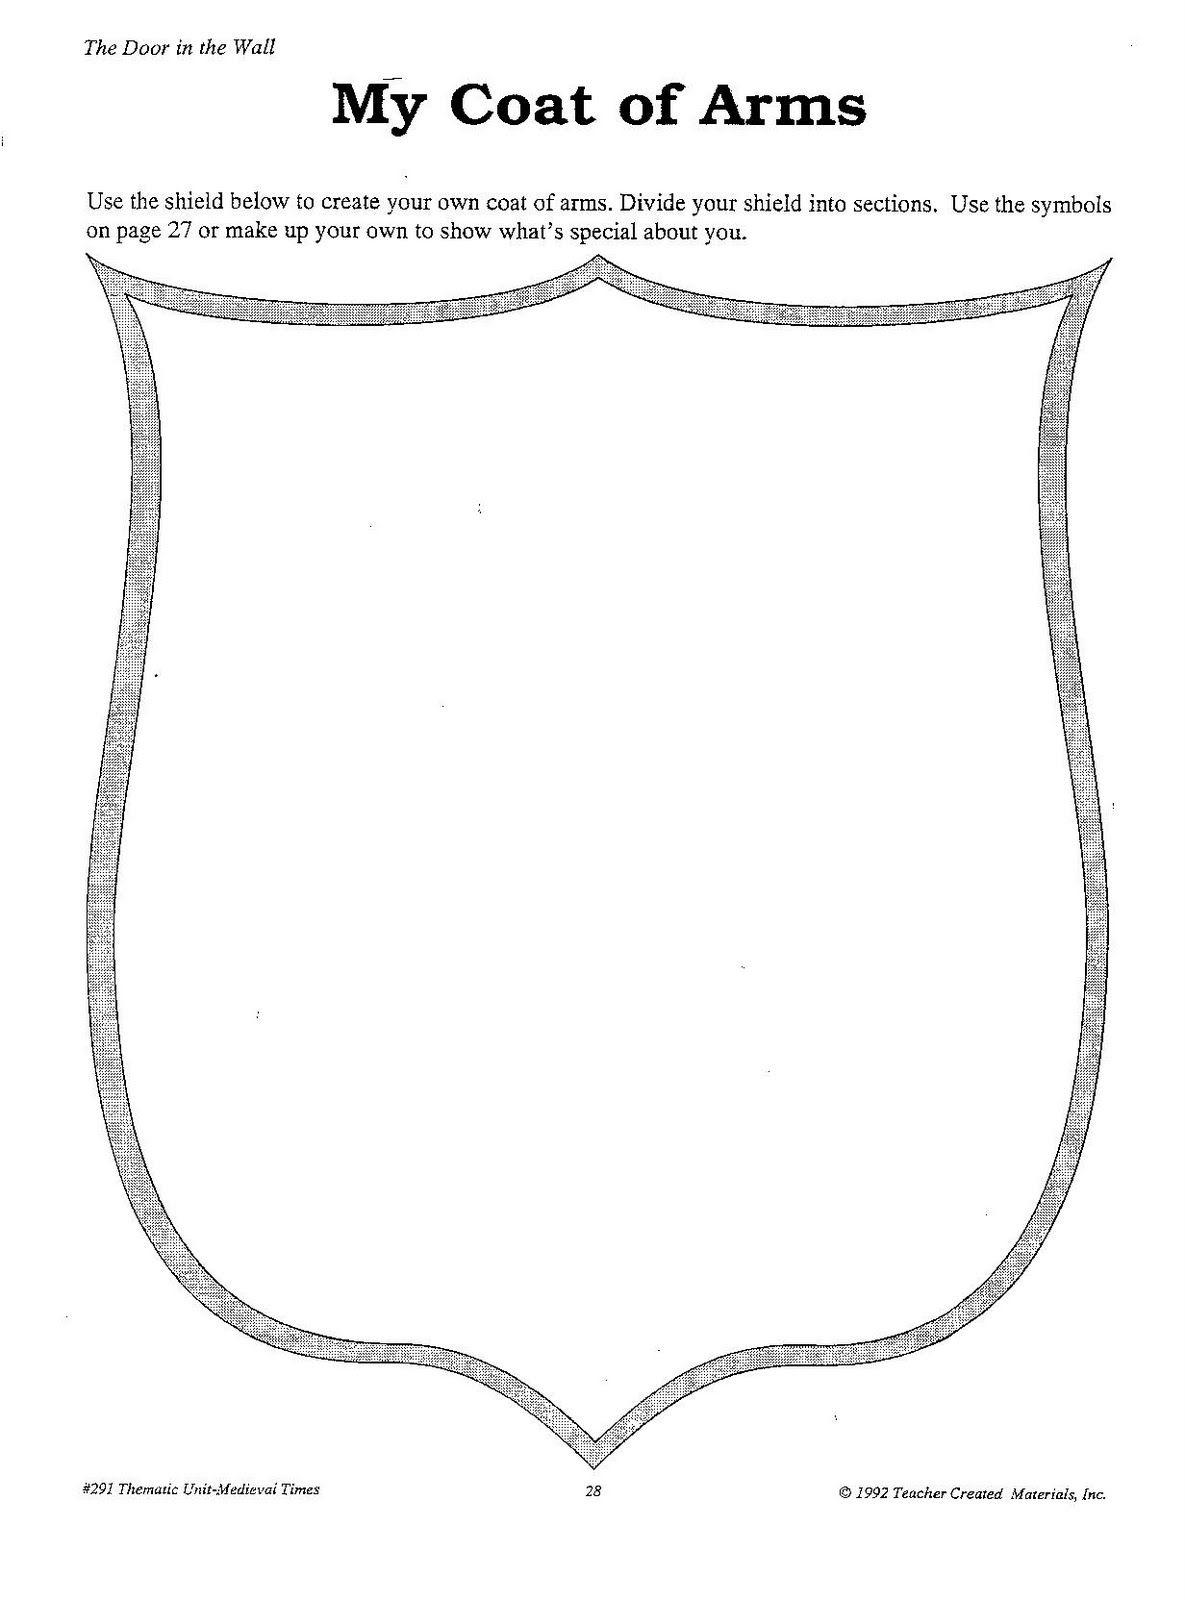 Personal Crest Outline Stantonsocialstu S